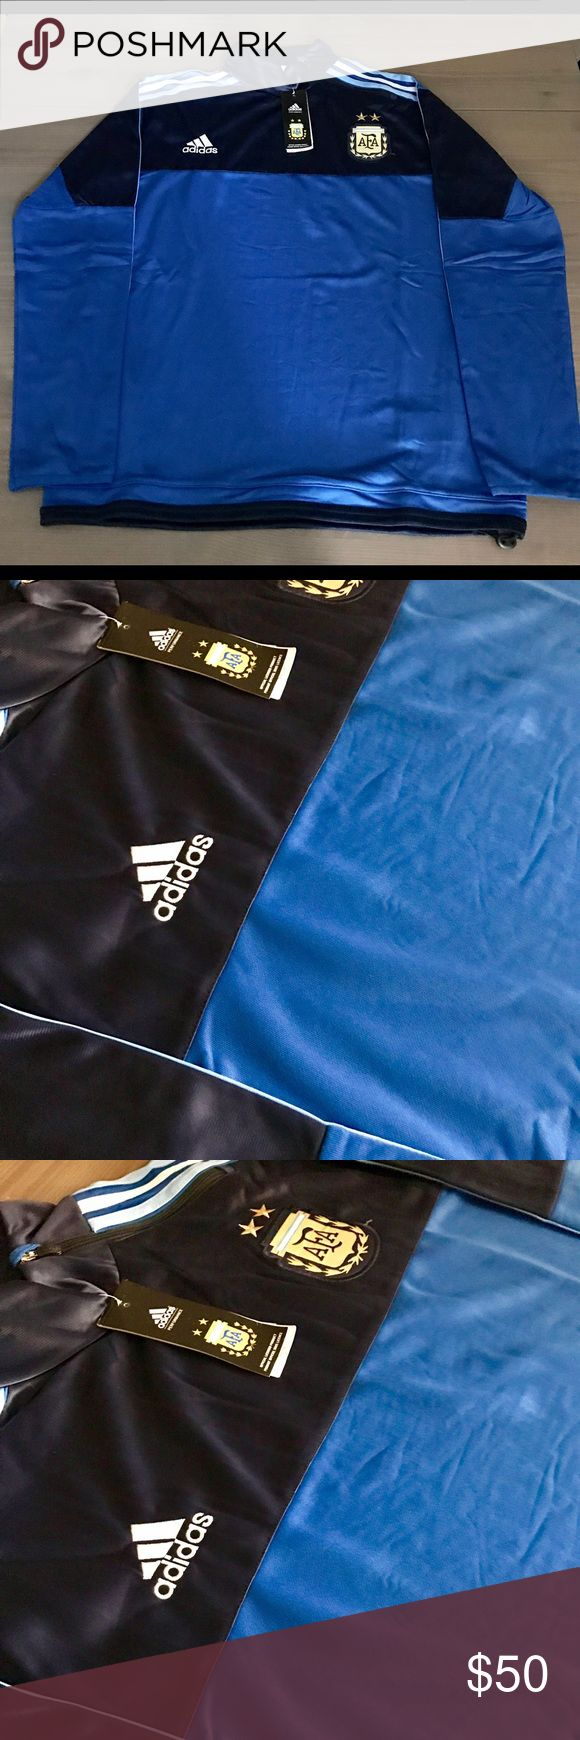 Argentina National team Sweater jacket adidas New Argentina National team Sweater jacket 16/17 adidas addidas Jackets & Coats Lightweight & Shirt Jackets